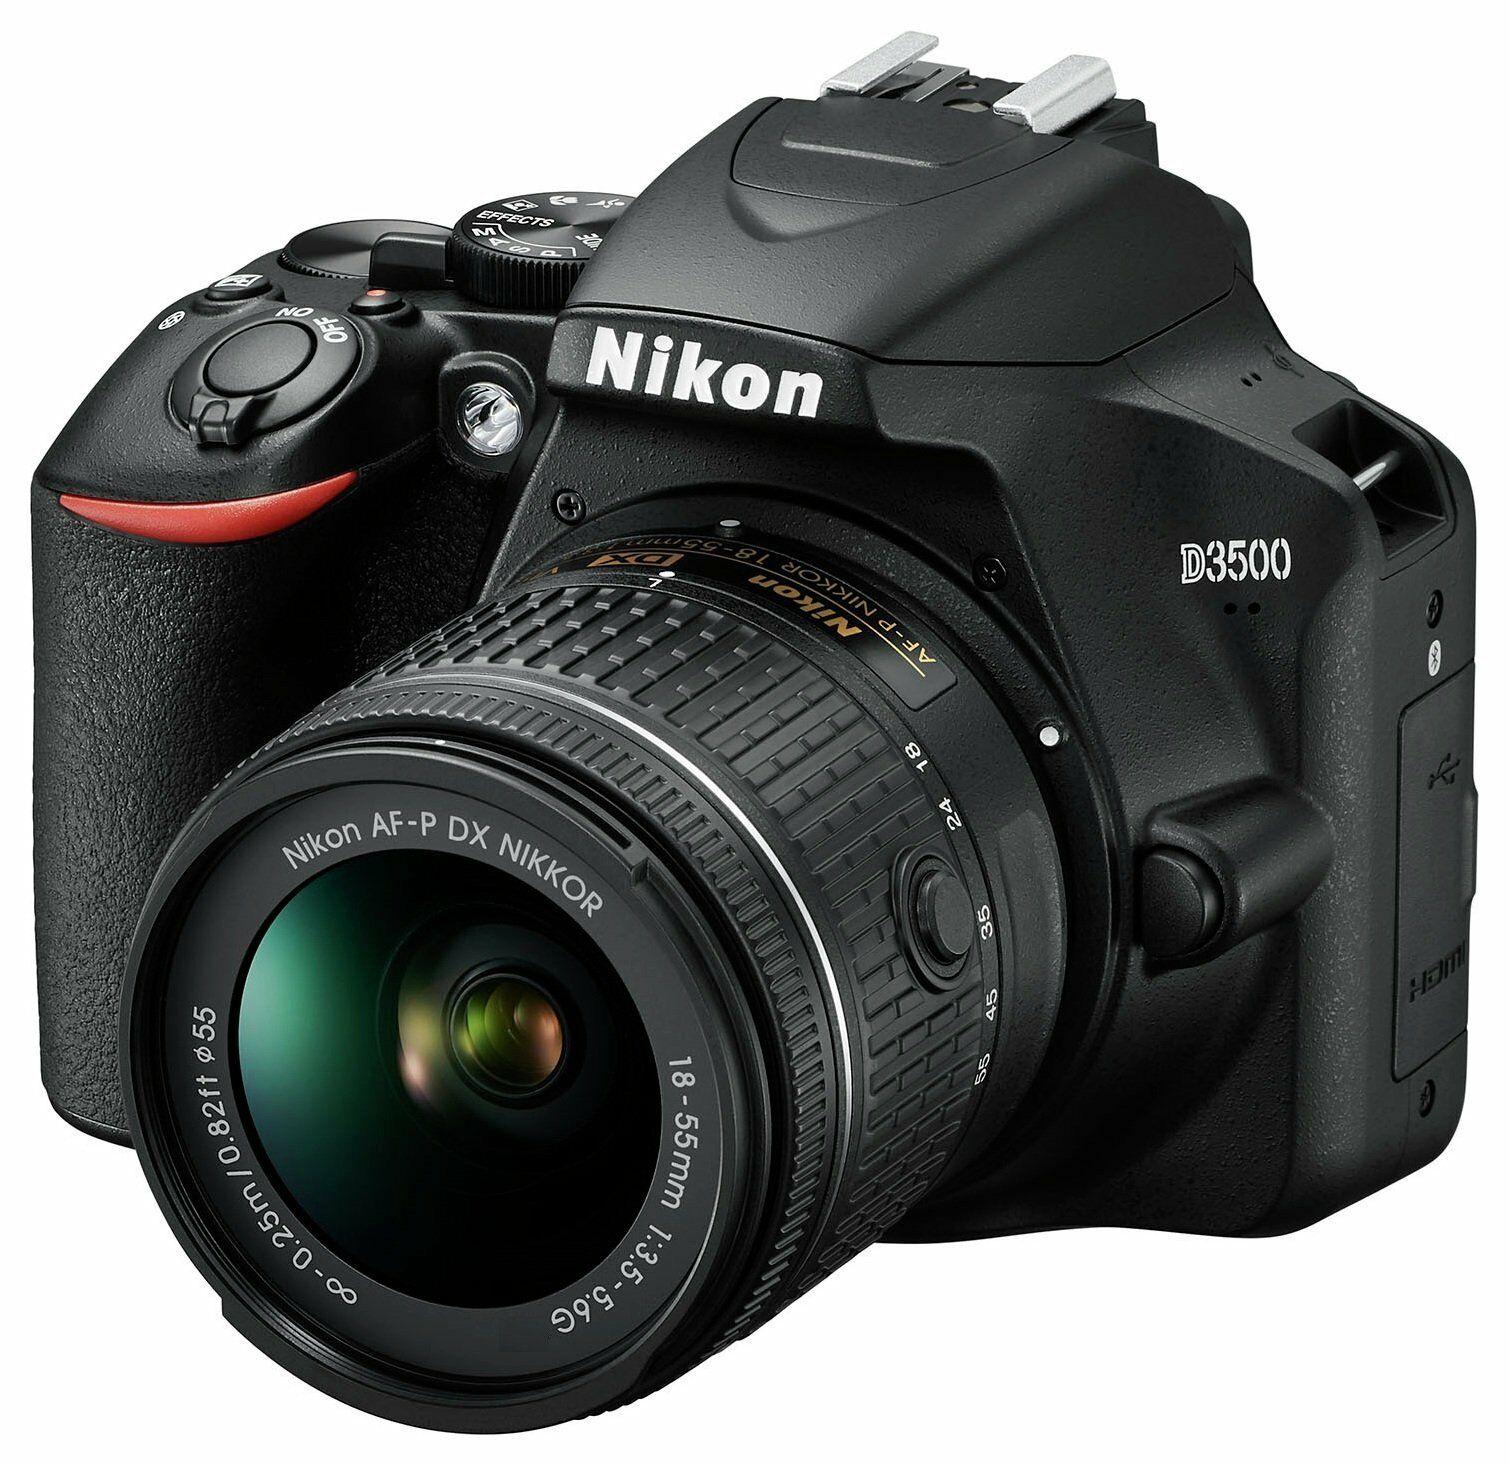 Nikon D3500 DSLR Camera with AFP DX 18-55mm Lens - £265.50 at Argos/ebay-with code